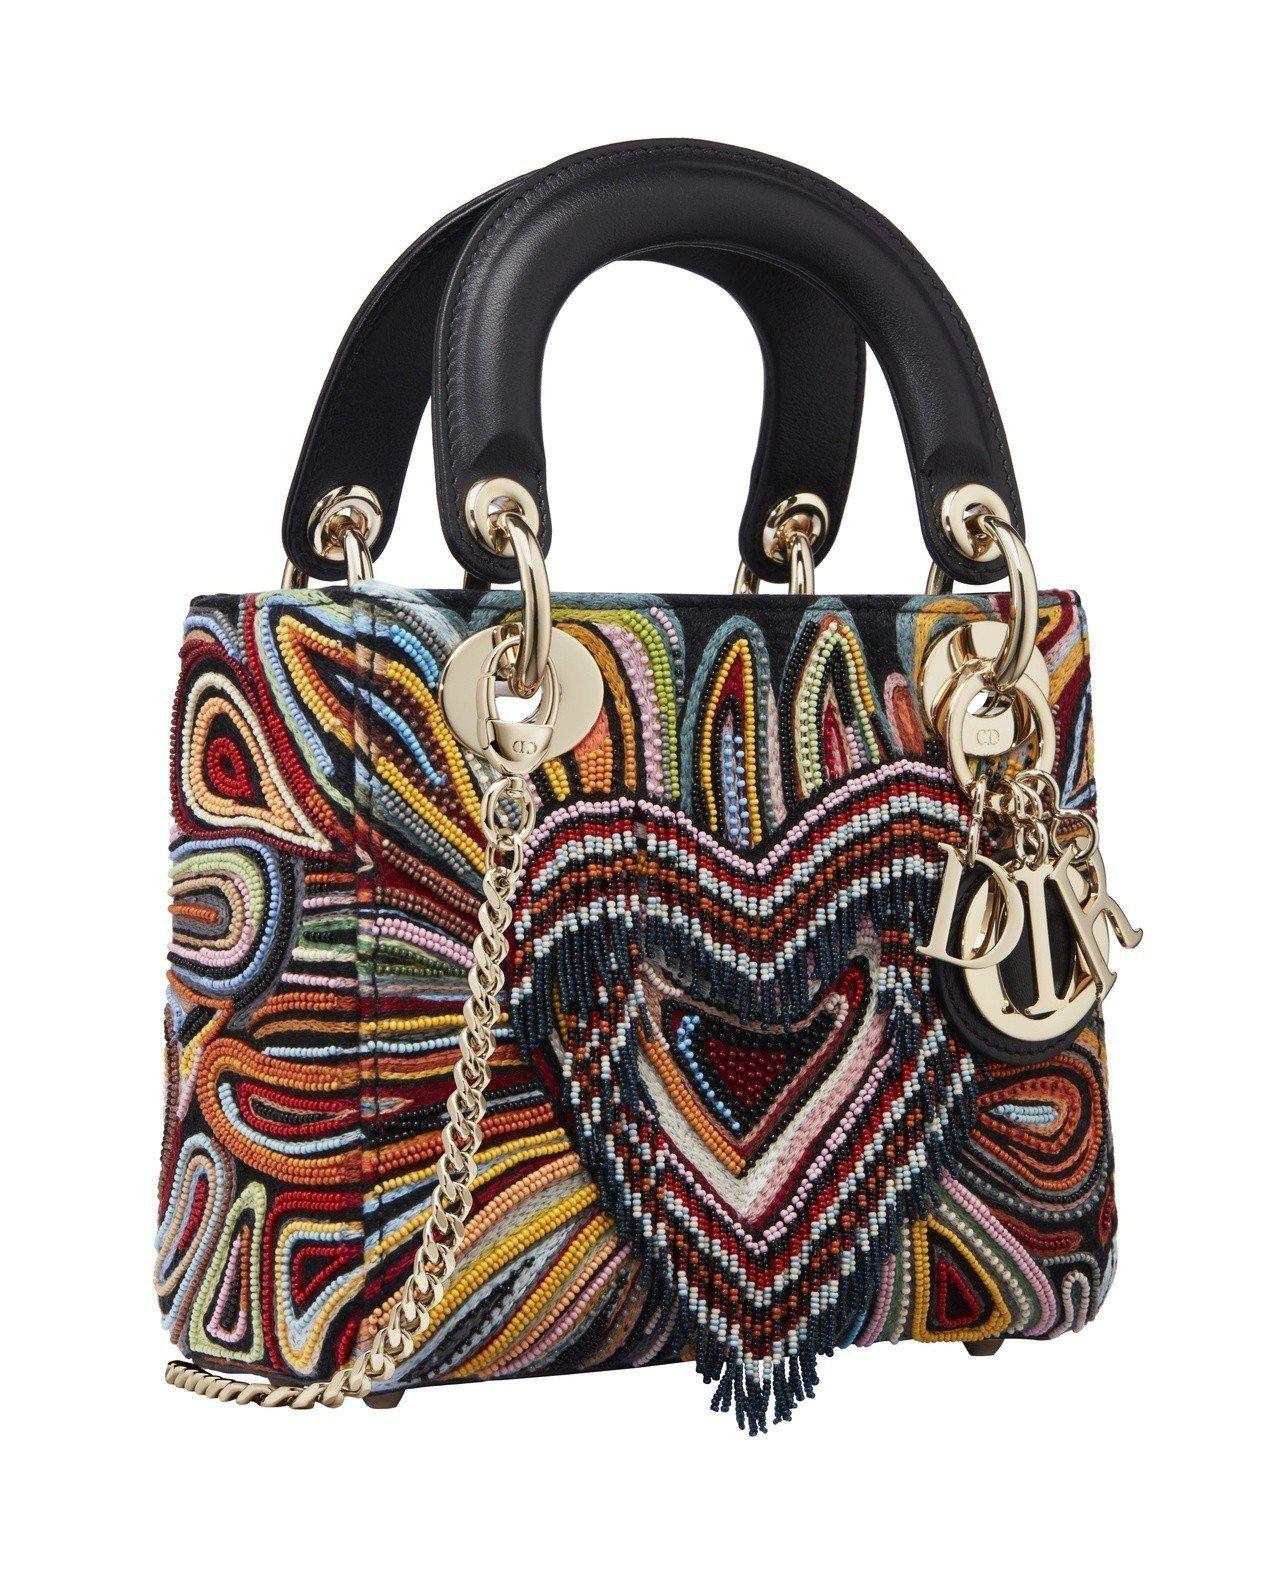 Lady Dior彩色Dioramour串珠刺繡迷你鍊帶包,售價14萬元。圖/D...